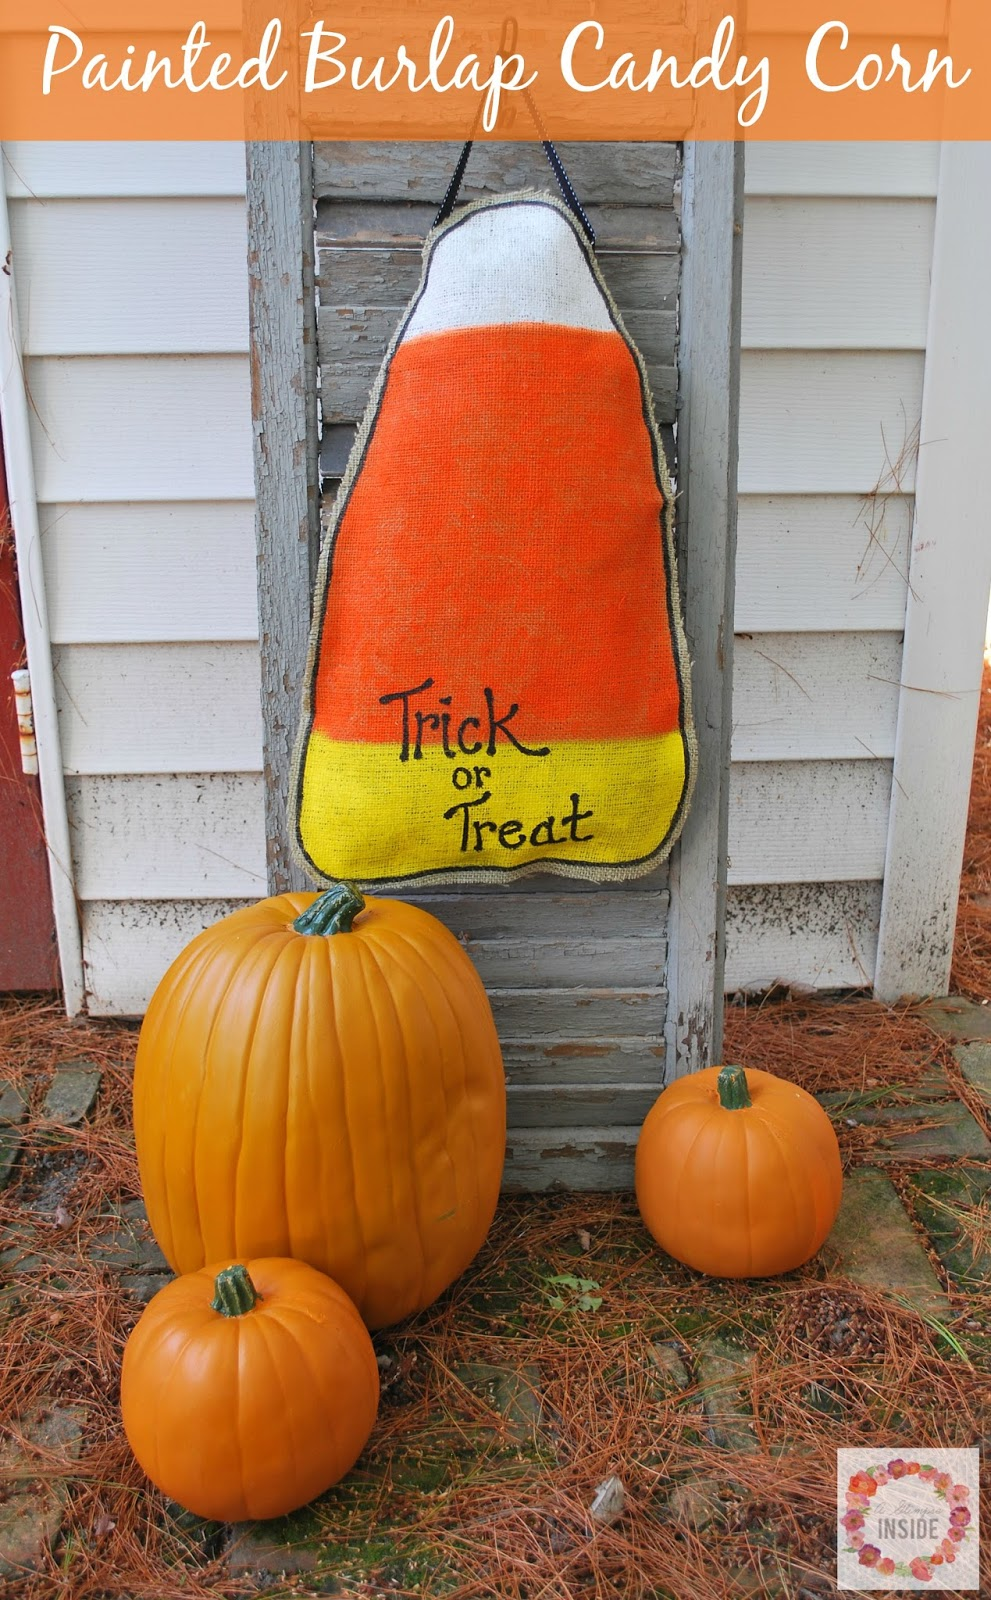 http://www.aglimpseinsideblog.com/2015/09/painted-burlap-candy-corn-hanging.html